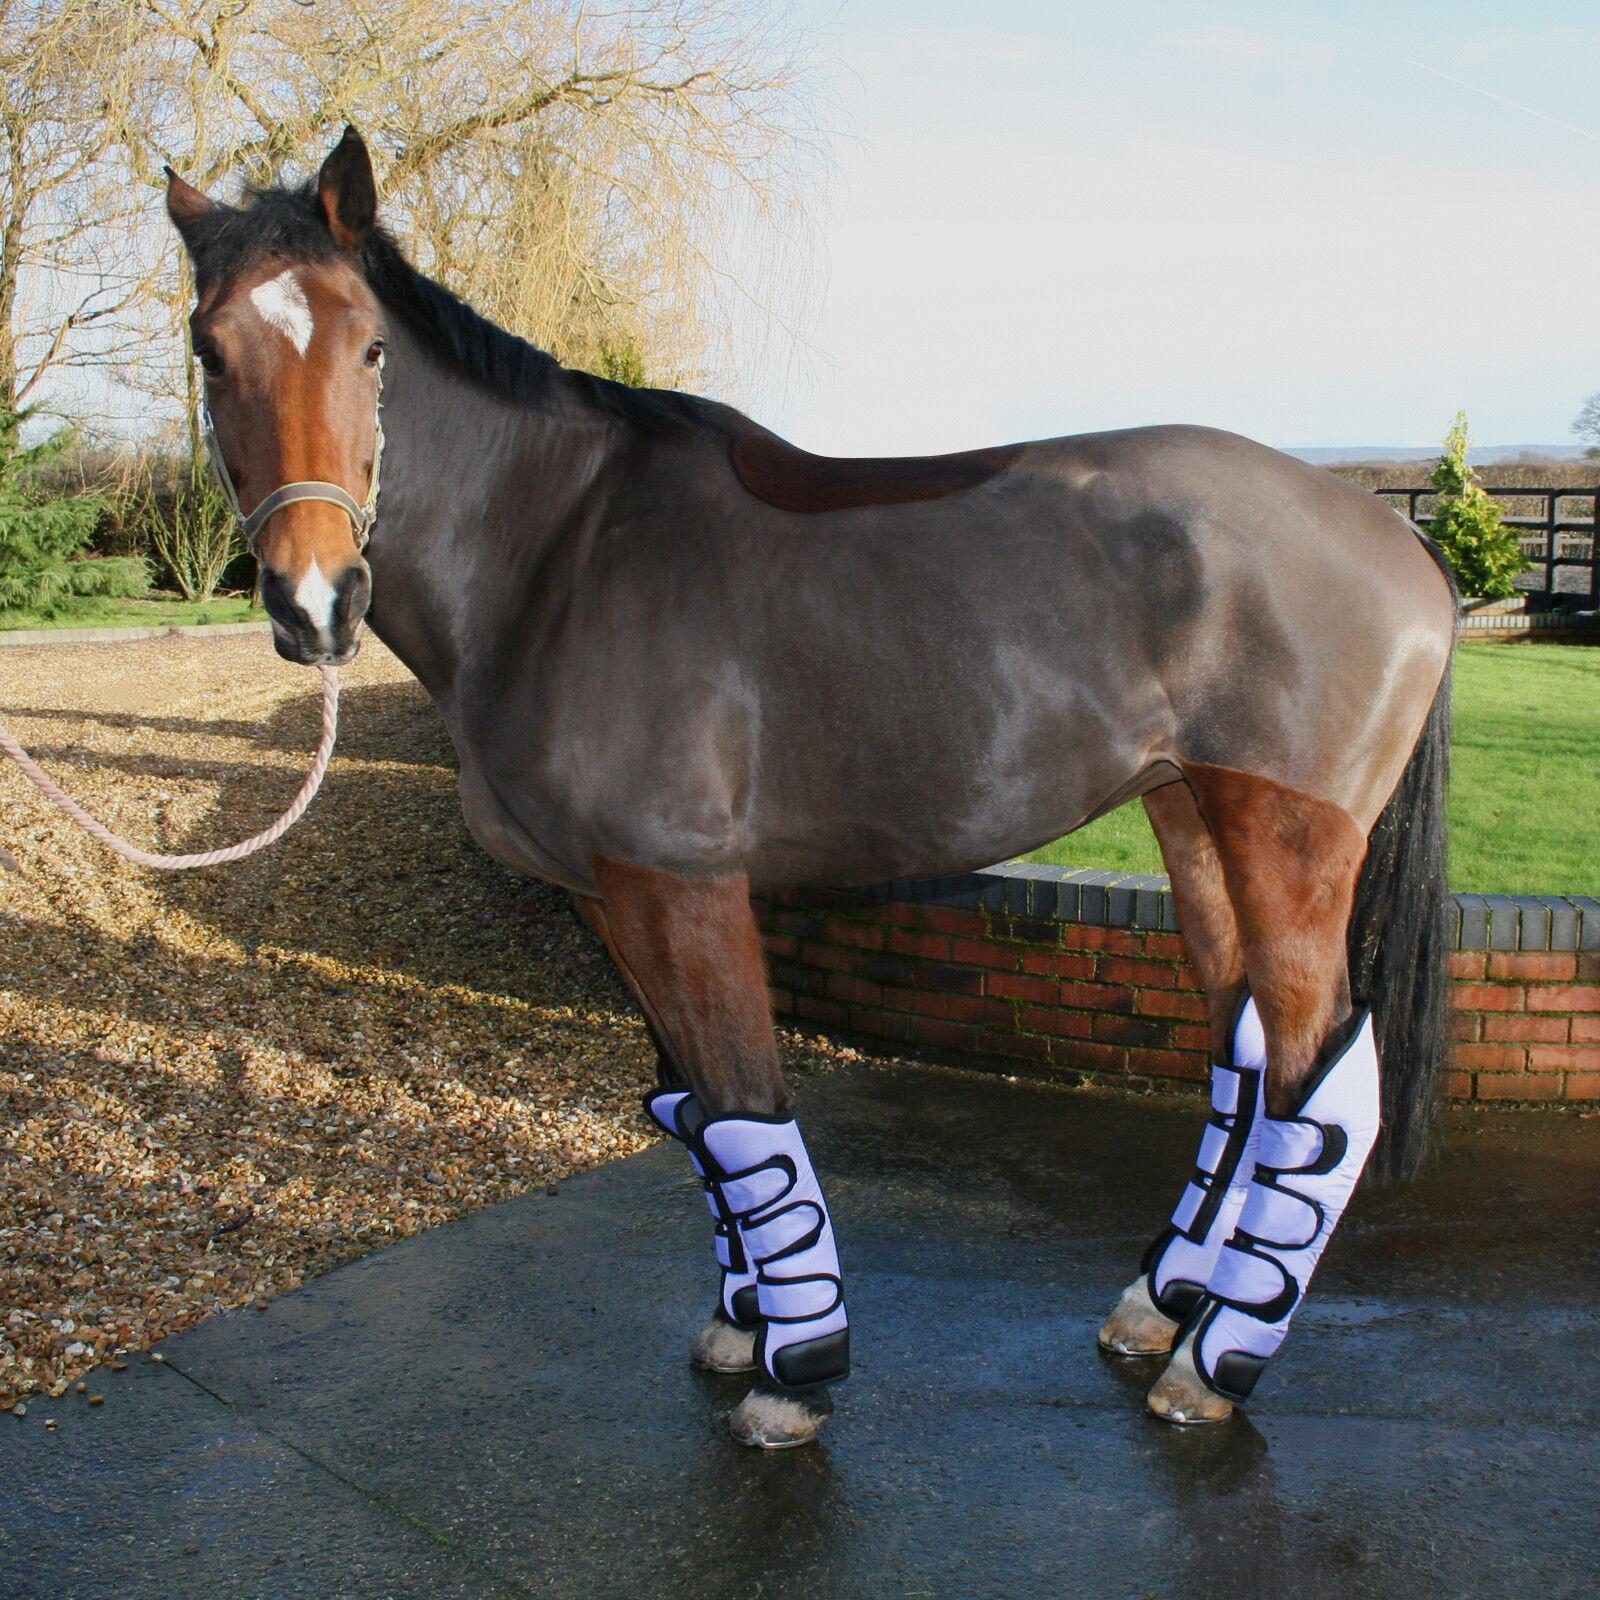 Horse Travel Boots Ripstop Nylon Fleece Lined Strong Velcro Straps - Full Set